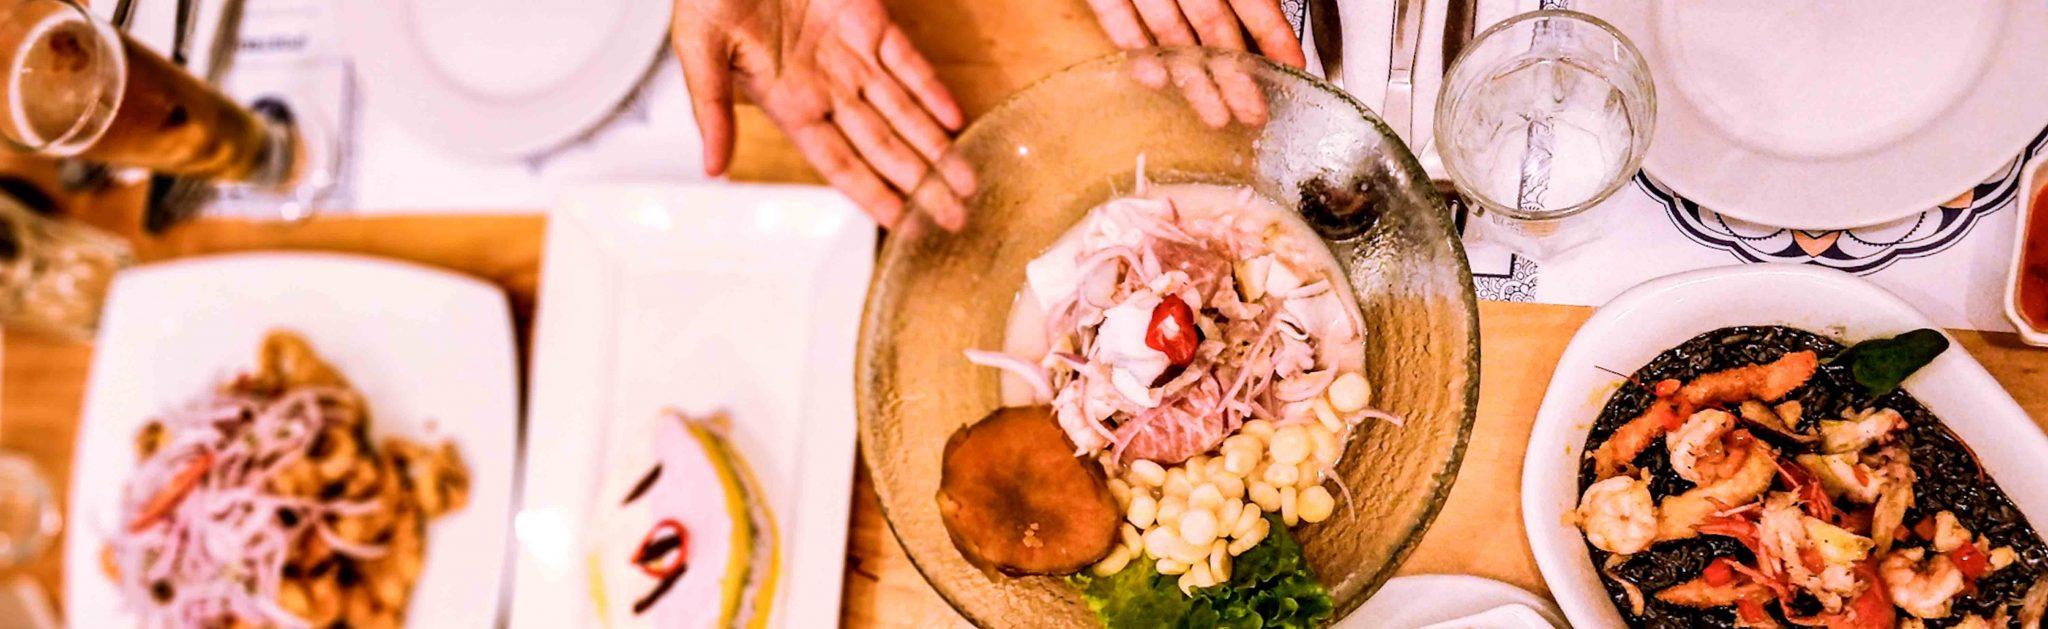 ¿Cuál es la mejor comida peruana?